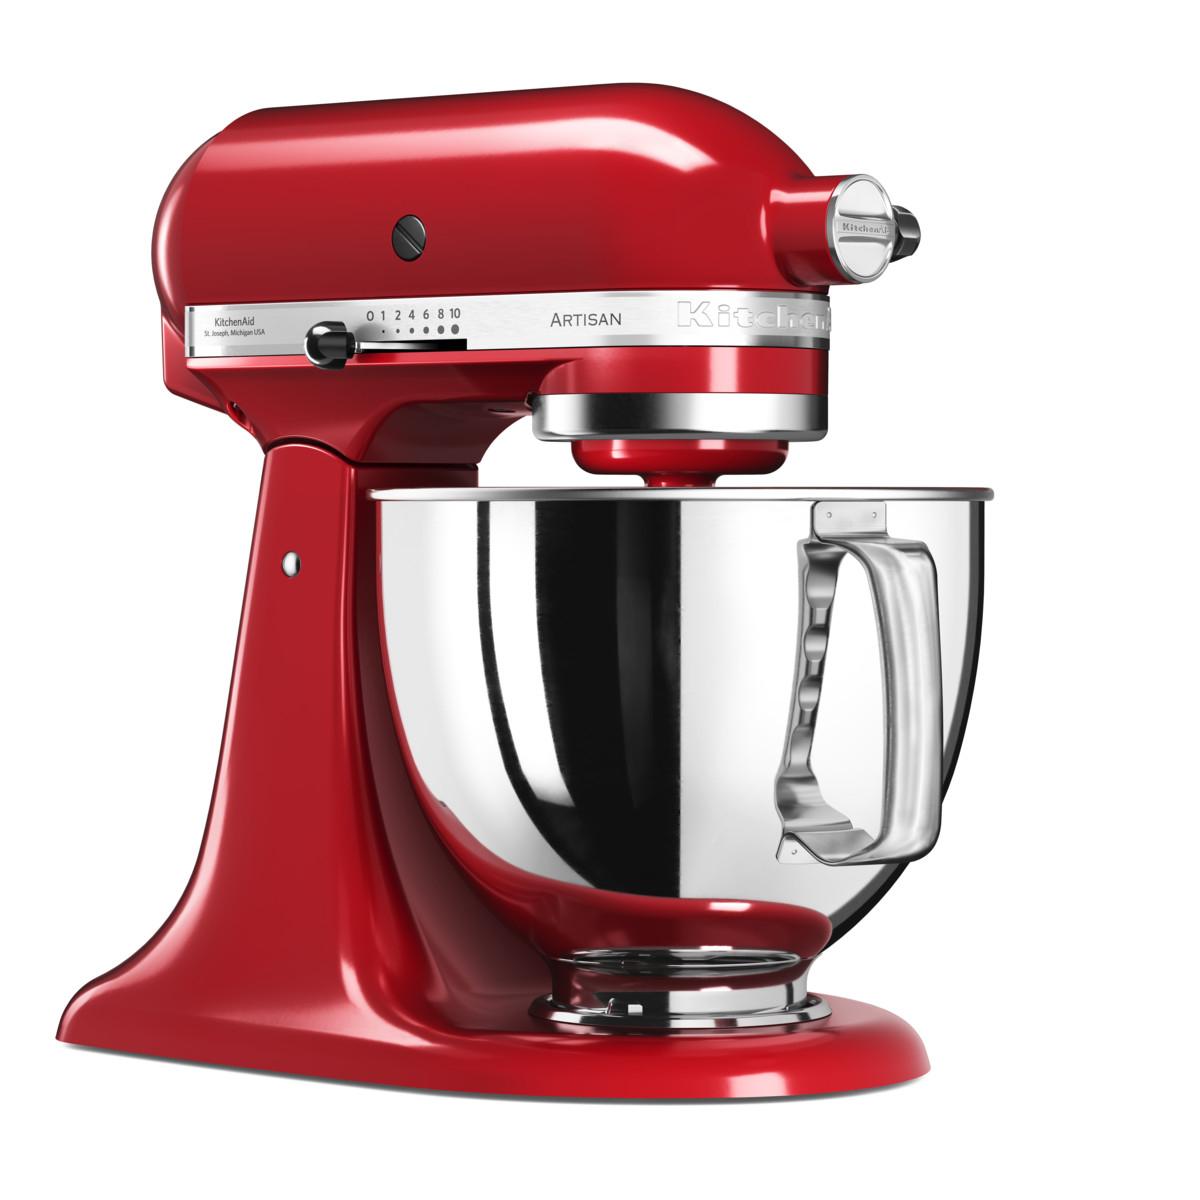 KitchenAid 5KSM125EER 300W 4.8L Rosso robot da cucina